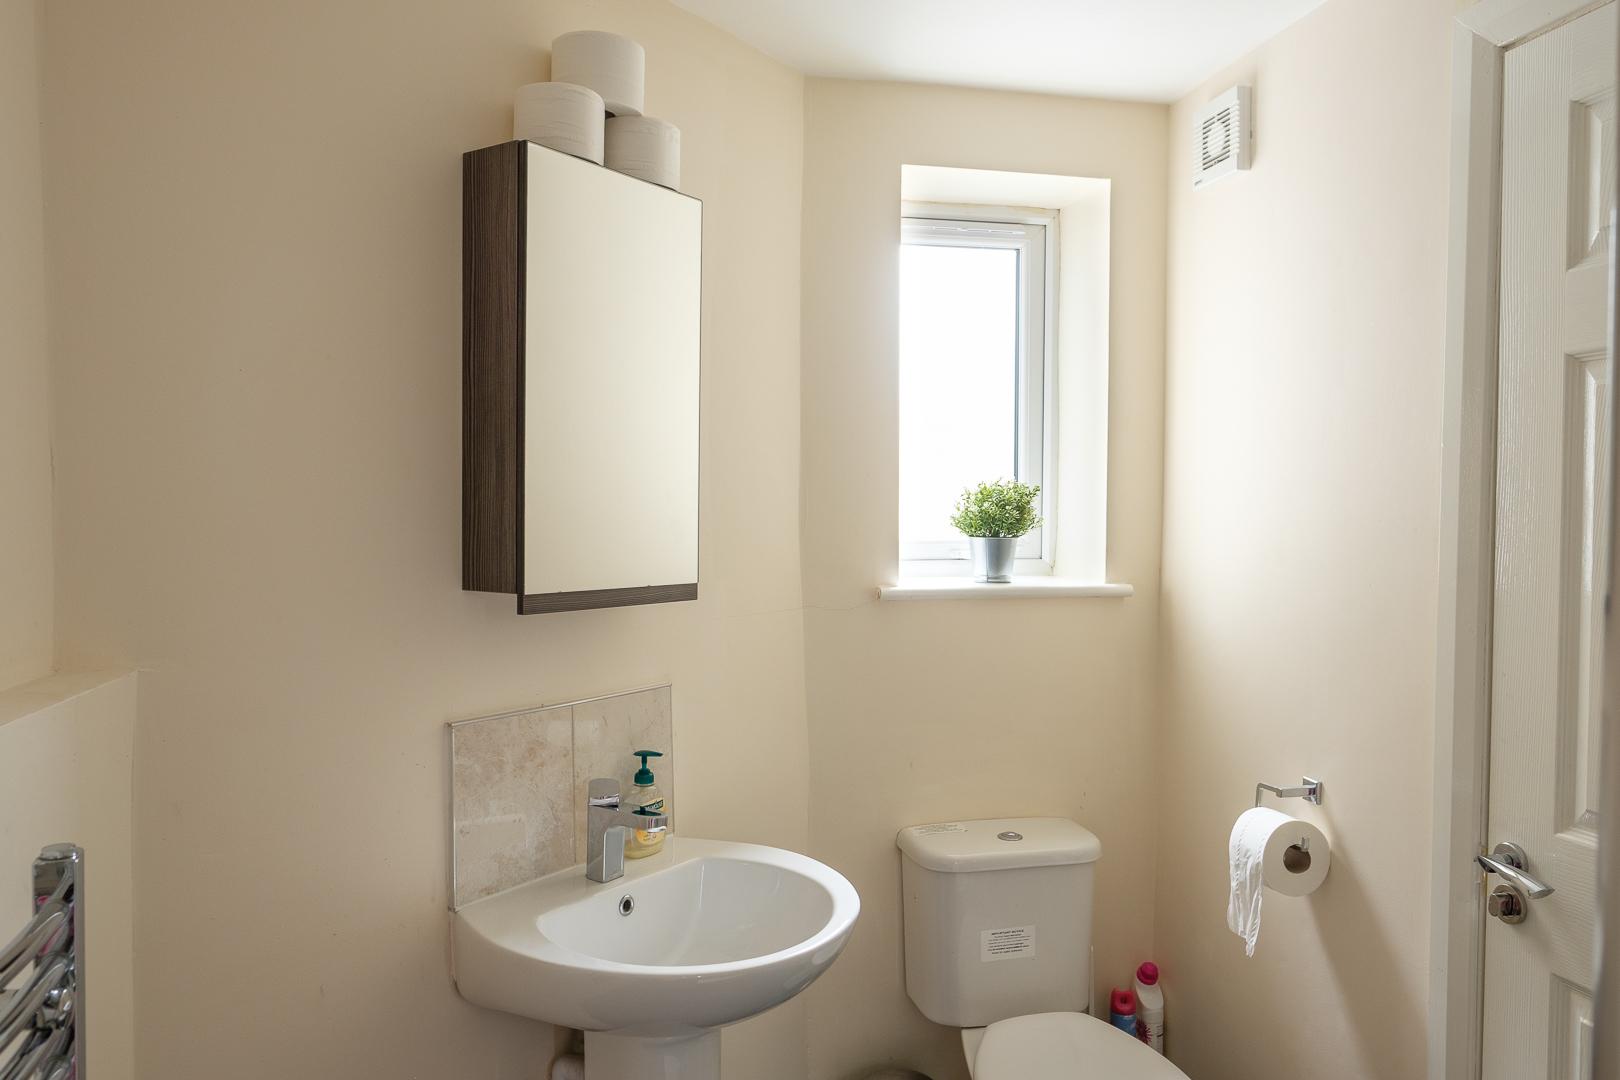 Sink at Broadwalk Apartment, Centre, Crawley